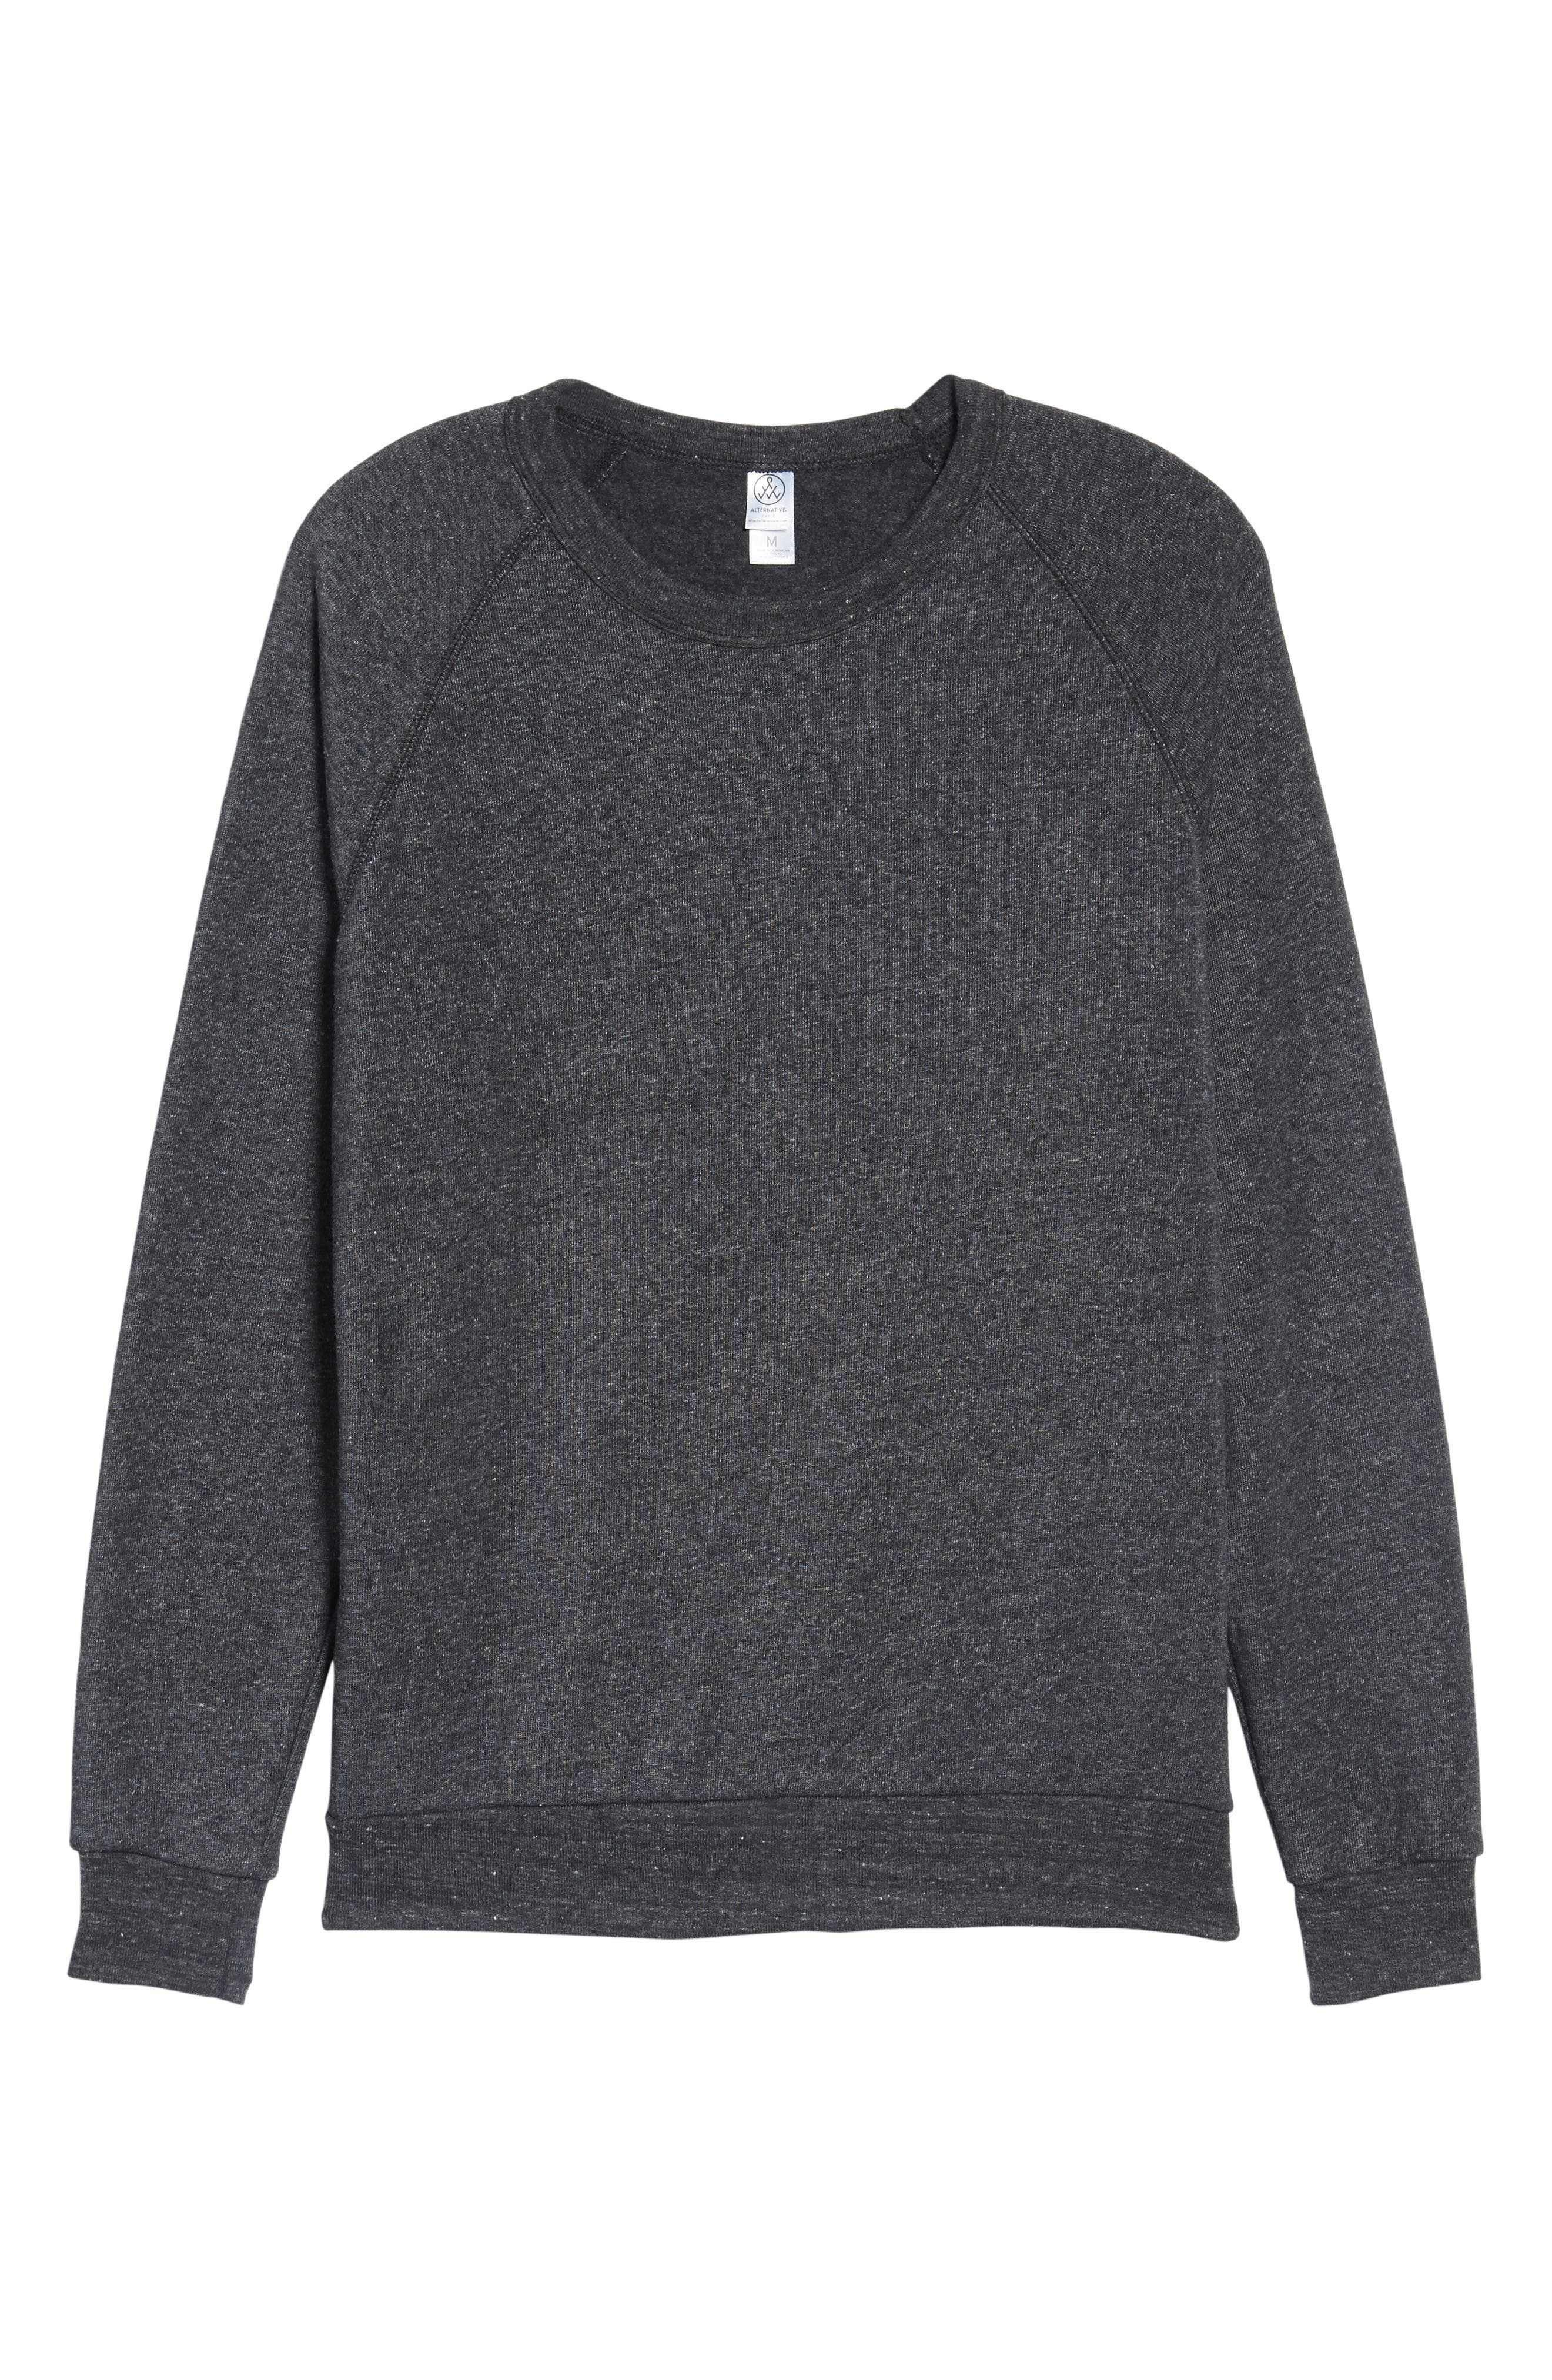 'The Champ' Sweatshirt,                             Alternate thumbnail 6, color,                             010